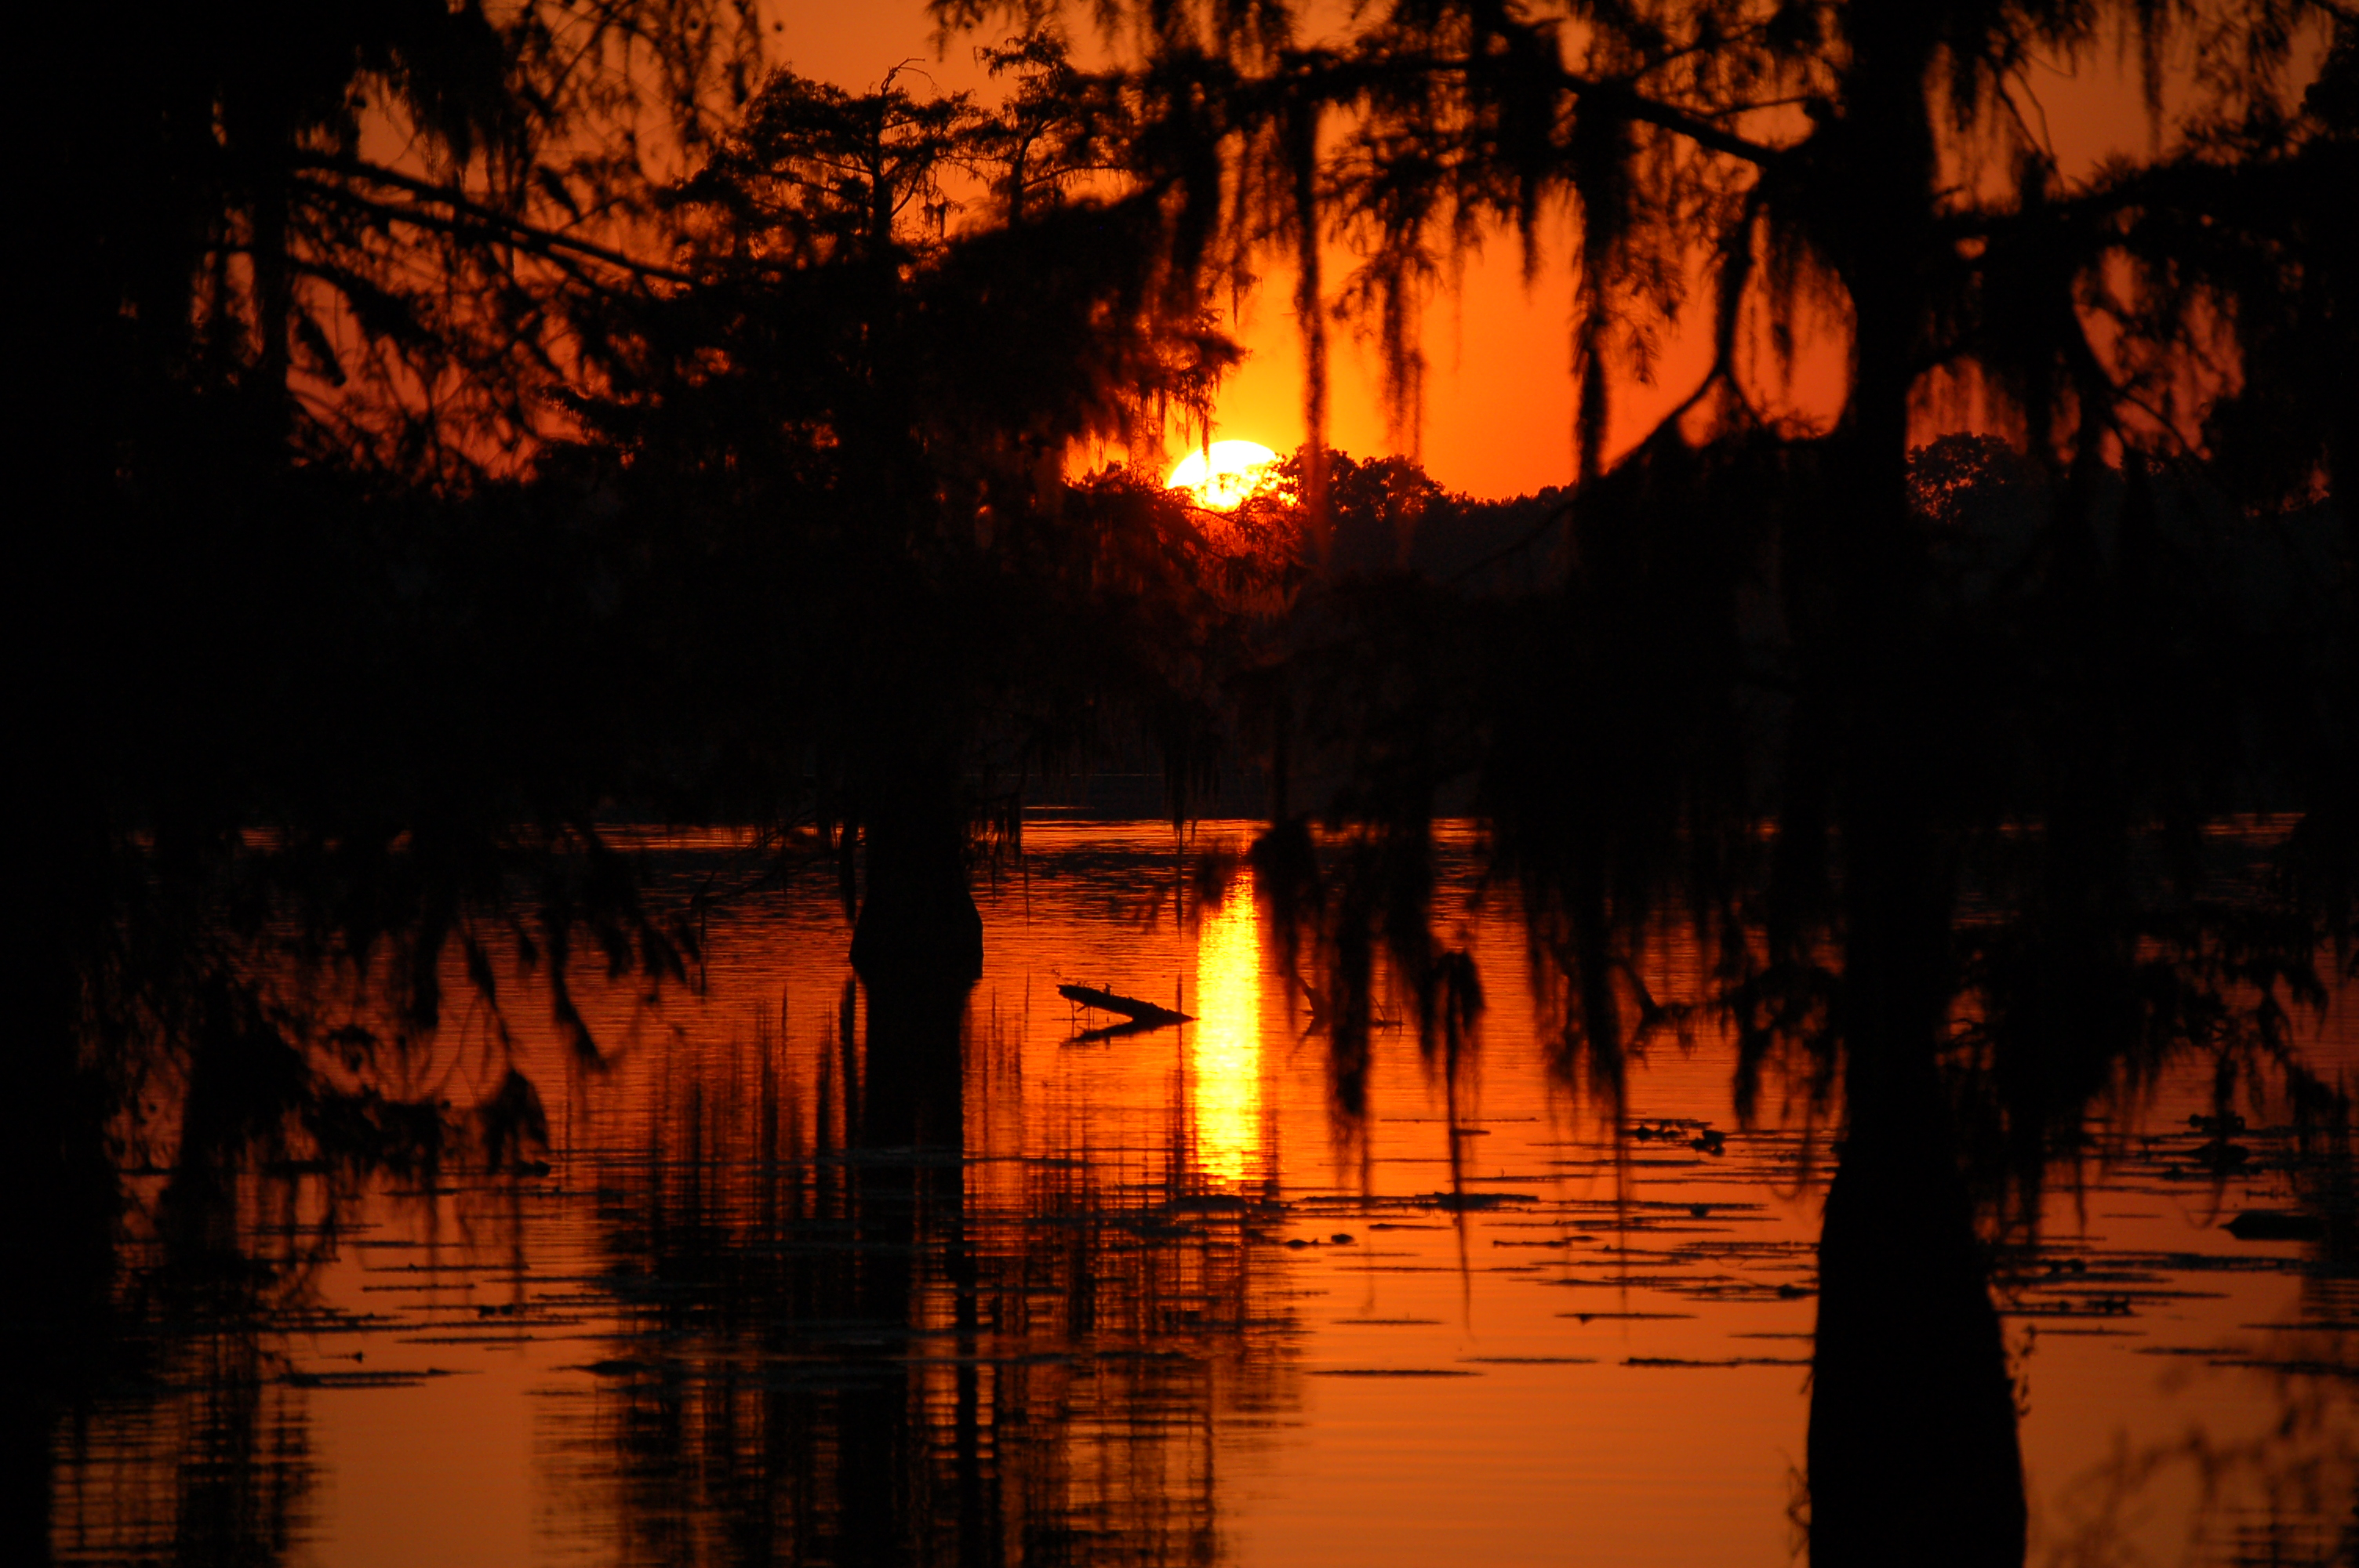 Country swamp photo